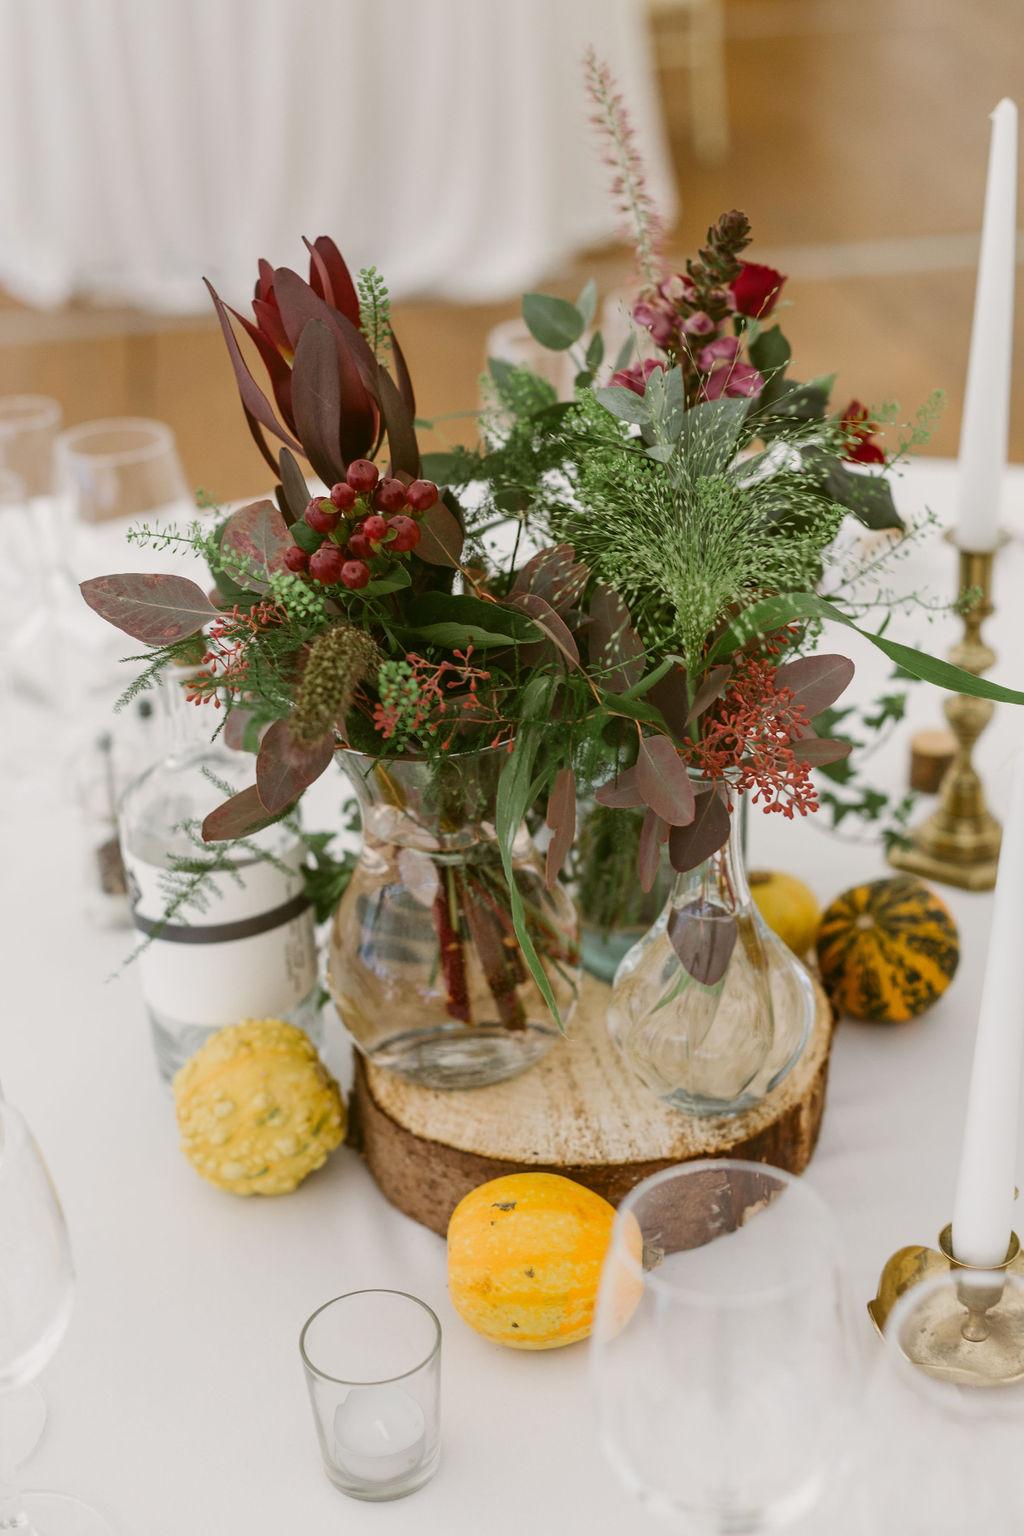 Wedding Table Centre Piece with pumpkins | Autumnal wedding decor | Scottish Wedding | Burgundy florals | Photography with wooden blocks